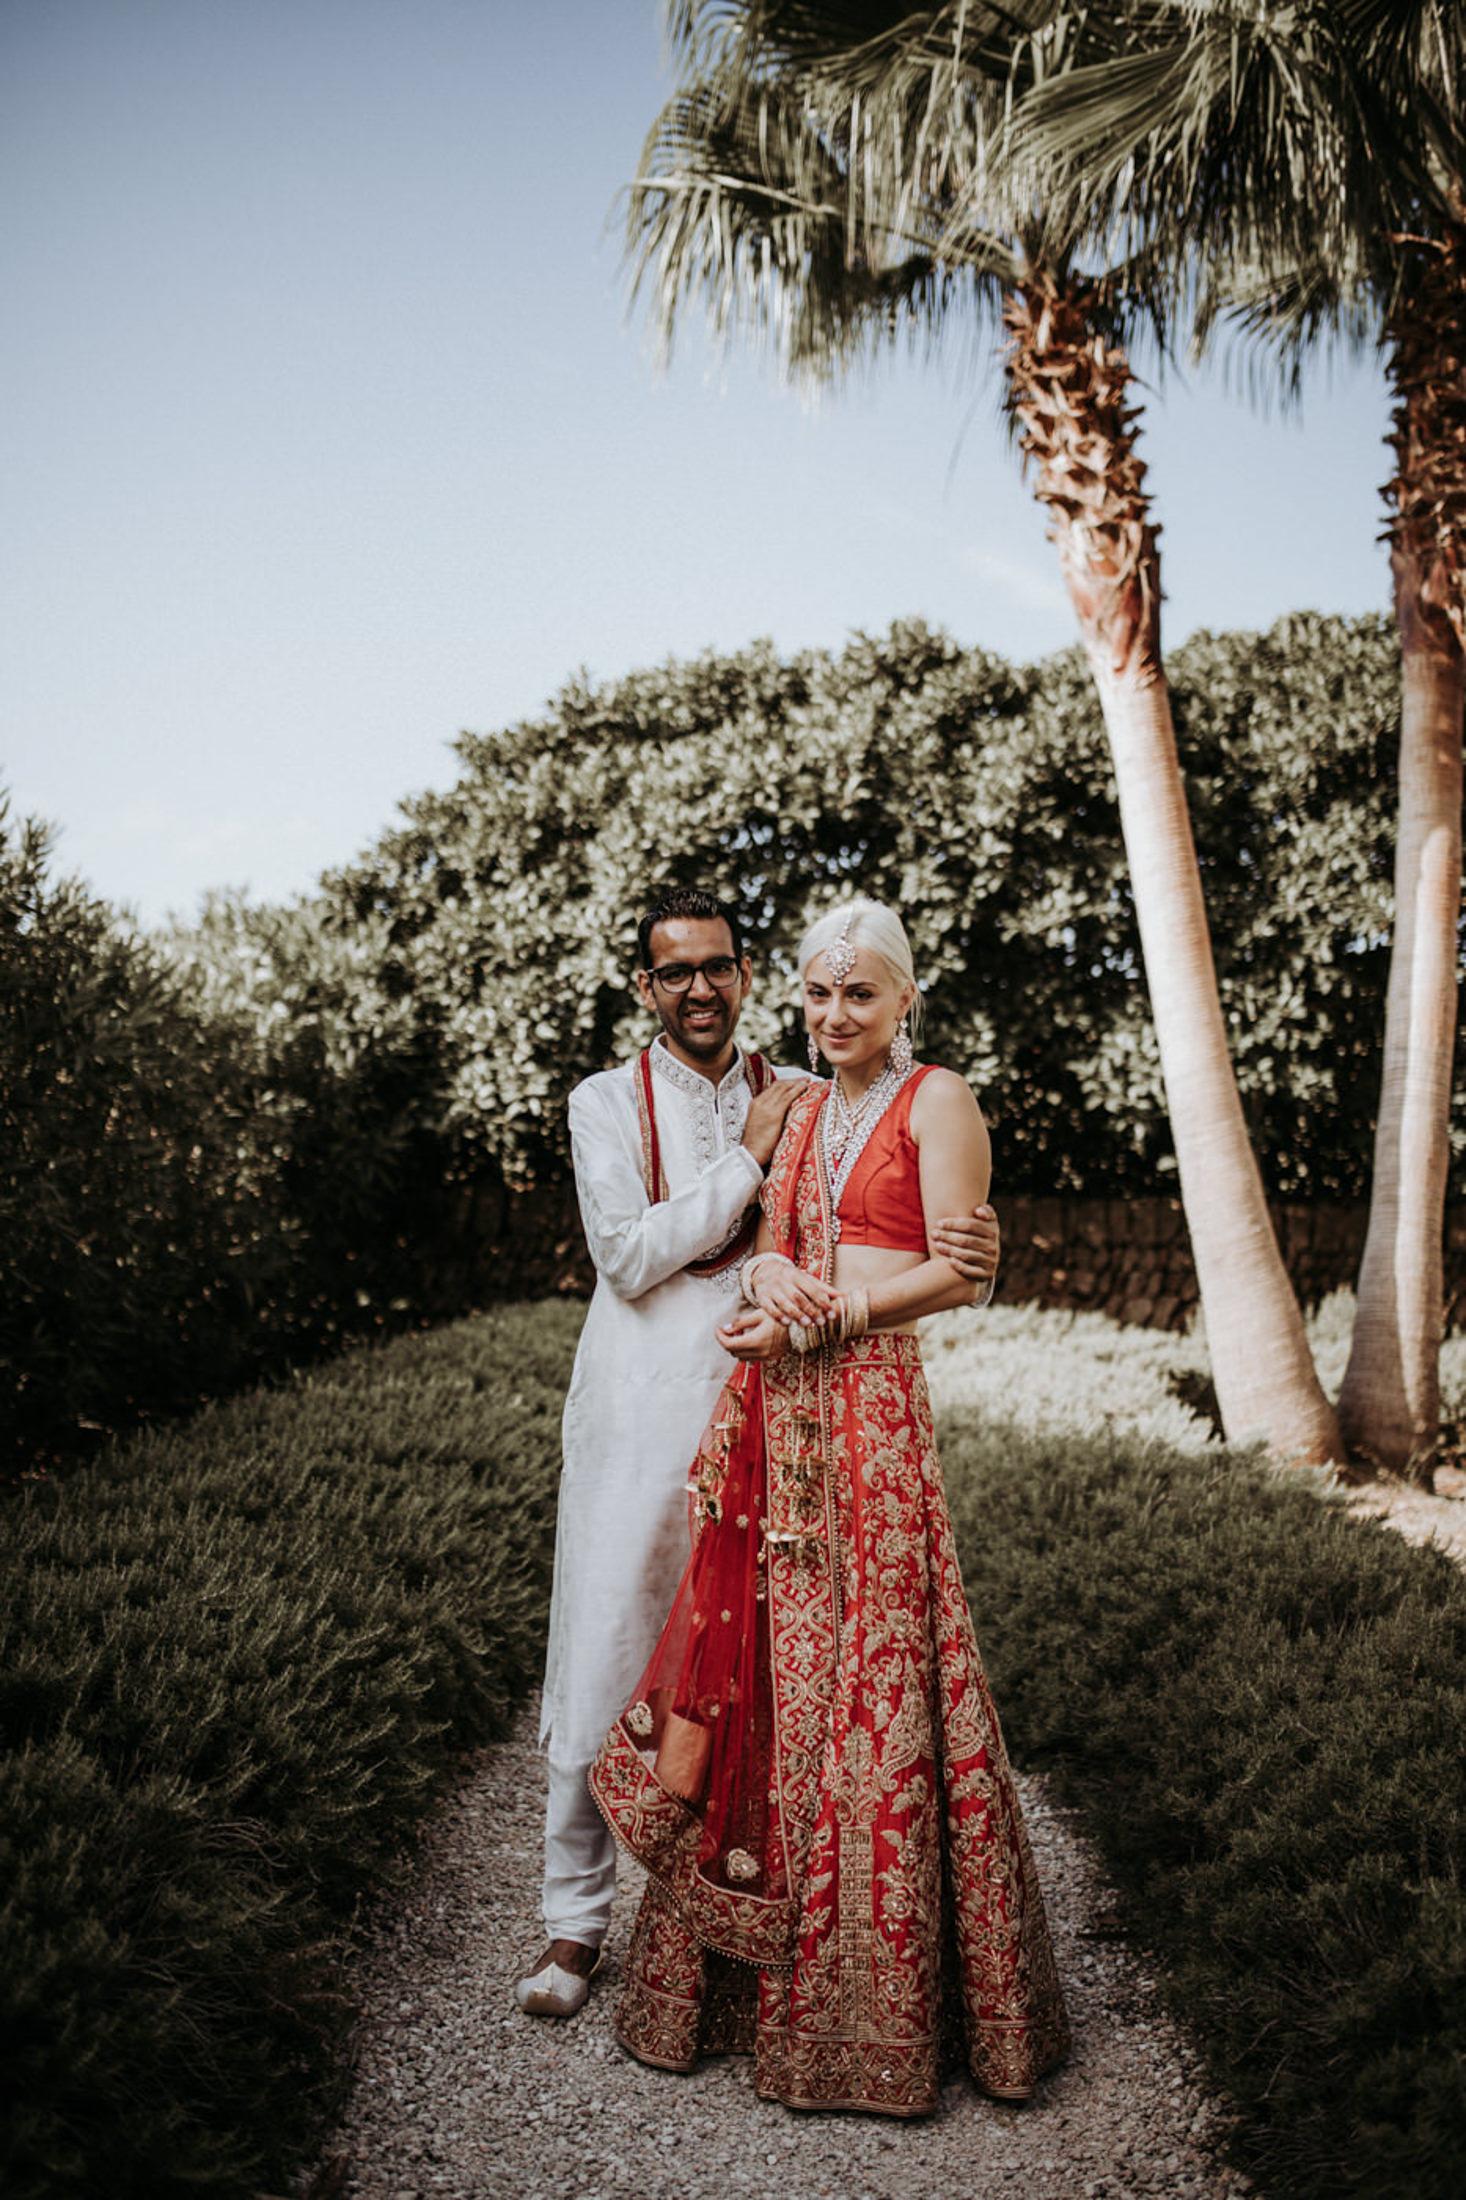 Wedding_Photographer_Mallorca_Daniela-Marquardt_Photography_New_York_Iceland_Tuscany_Santorini_Portugal_Austria_Bavaria_Elopement_Hochzeitsfotograf_AntjeRajat2_61